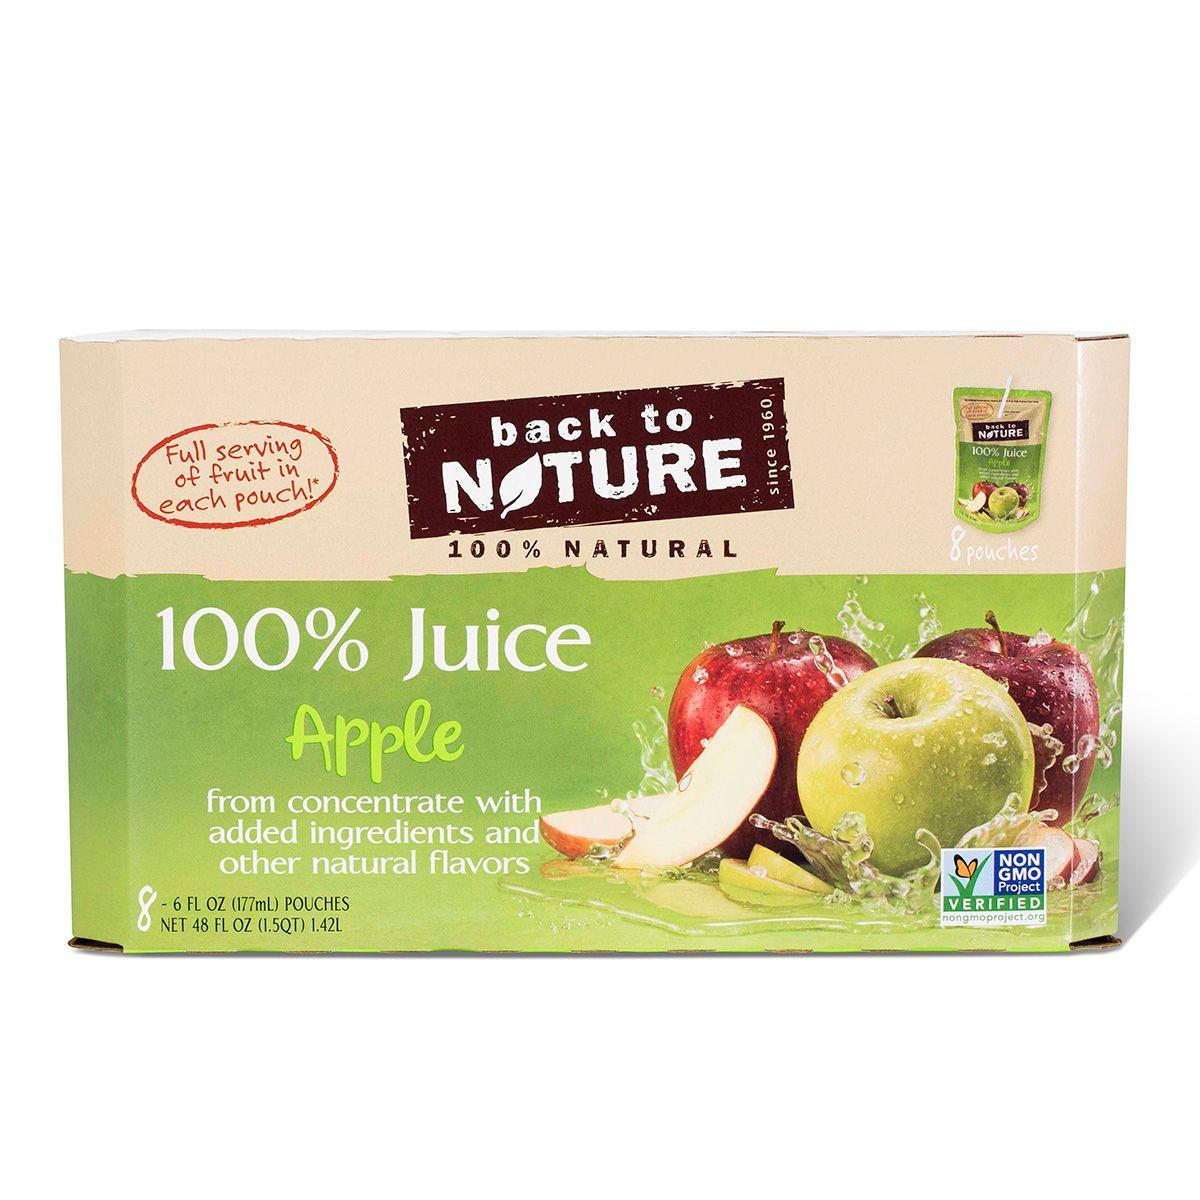 Back to Nature 100 Juice Apple Tasty ingredients